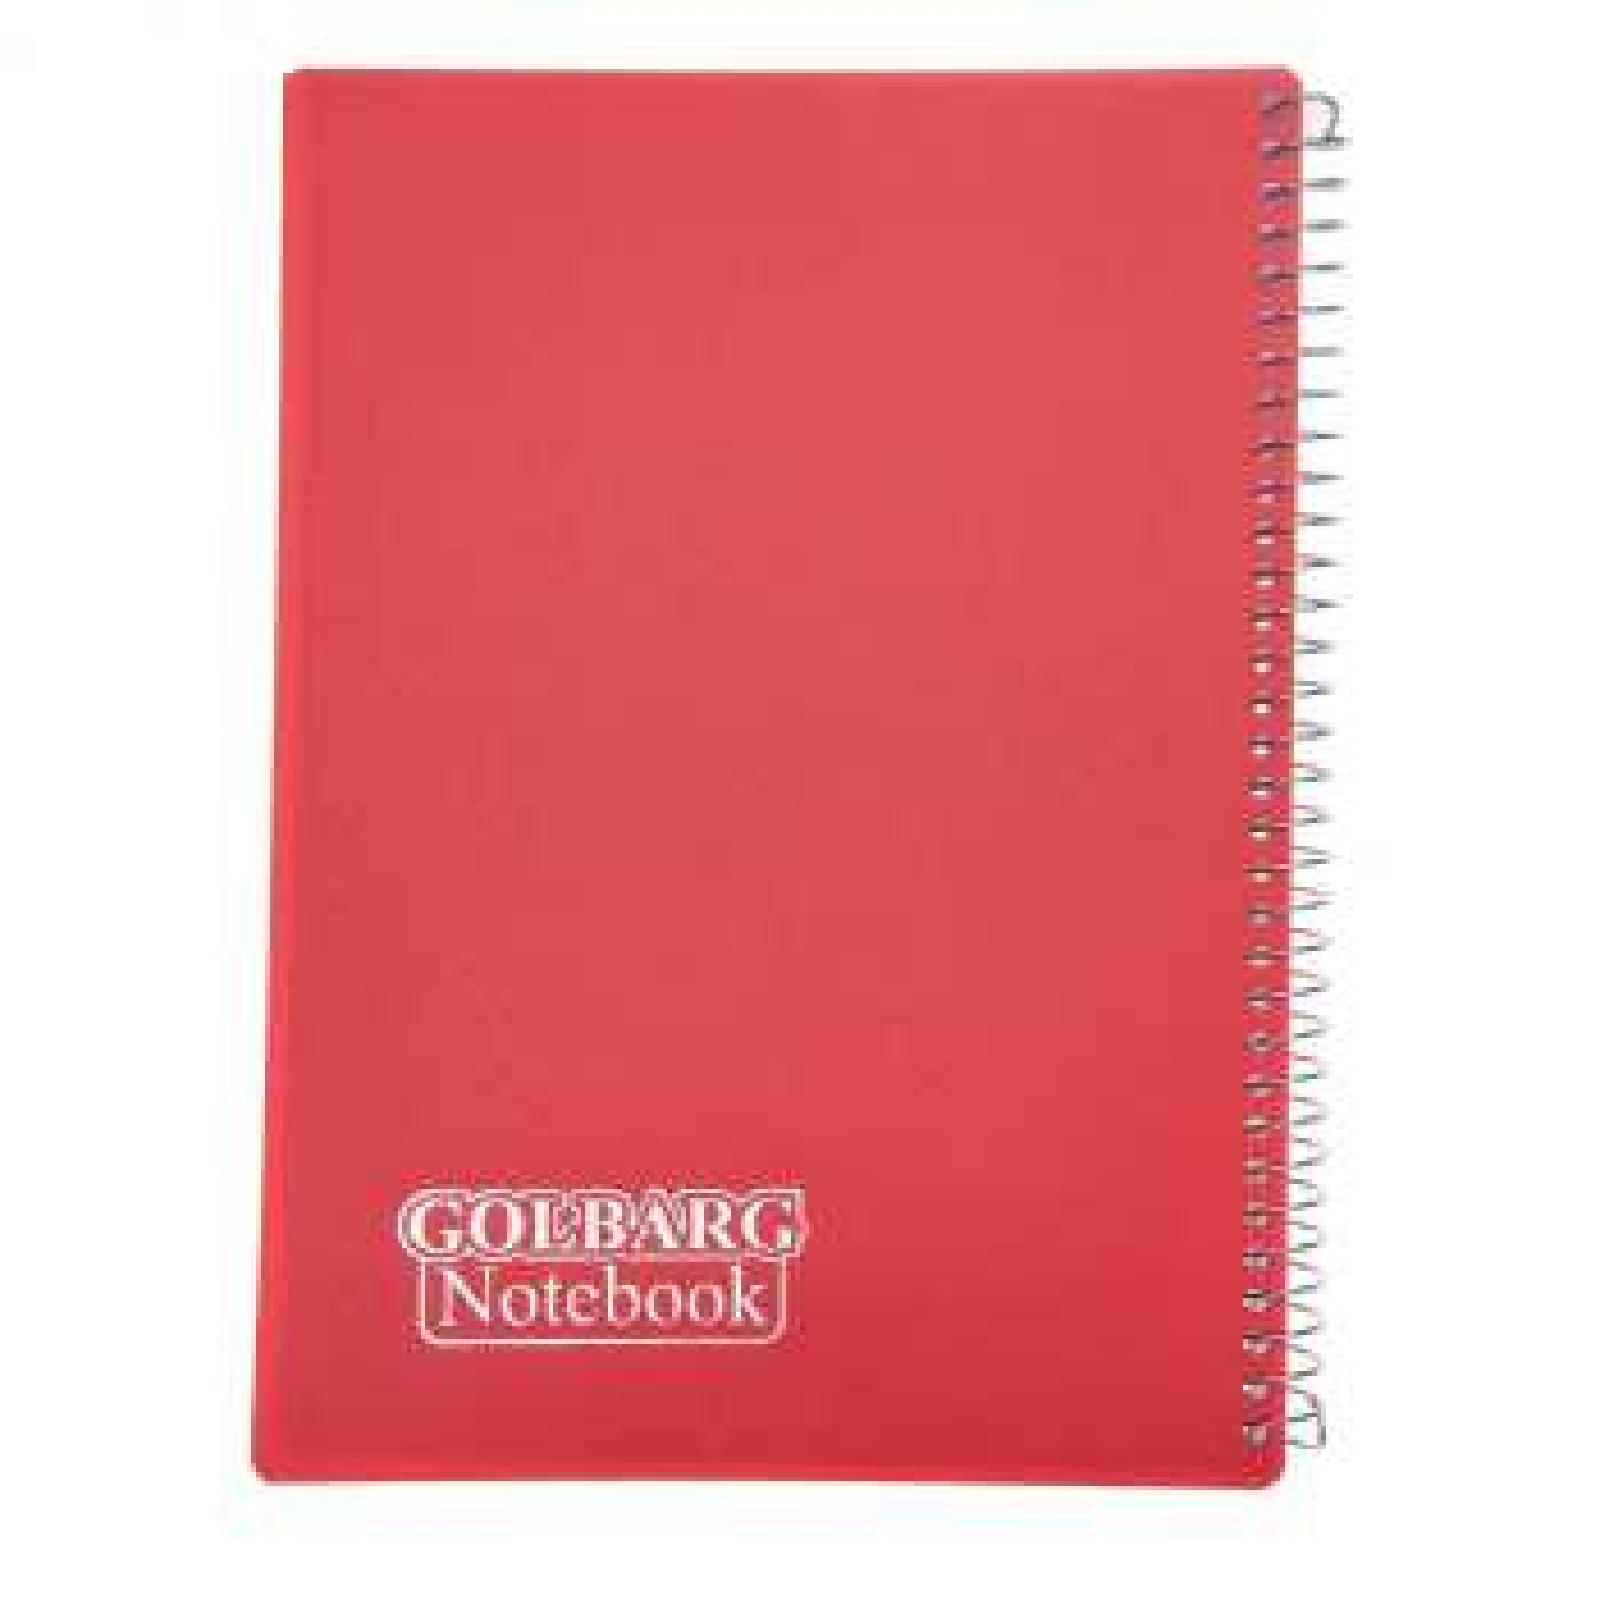 دفتر مشق گلبرگ کد DM01